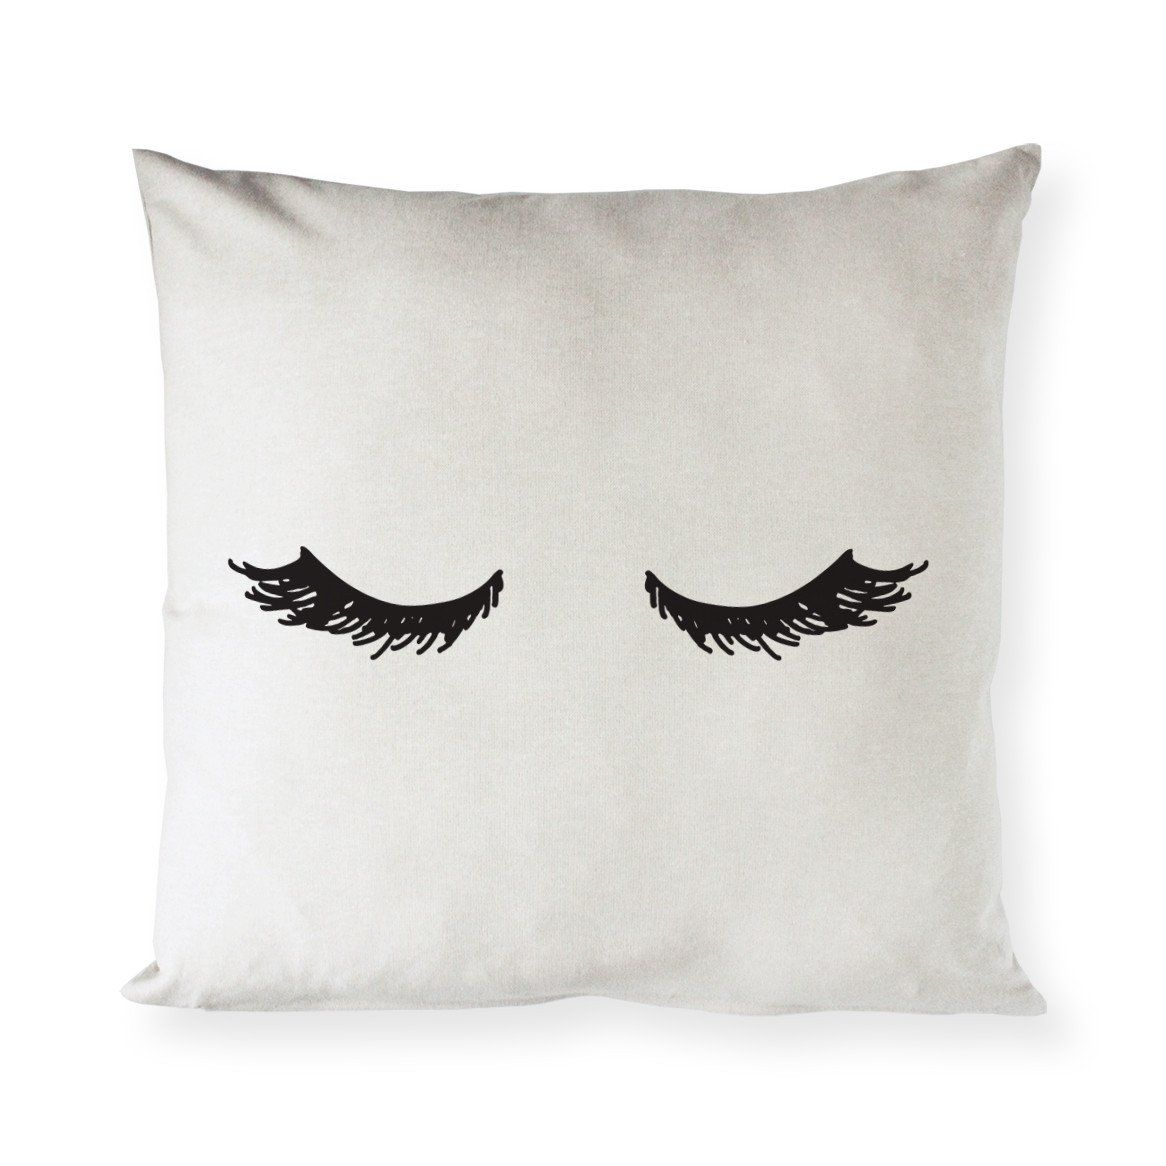 Mascara closed eyelashes pillow cover pillow fashion onthemove